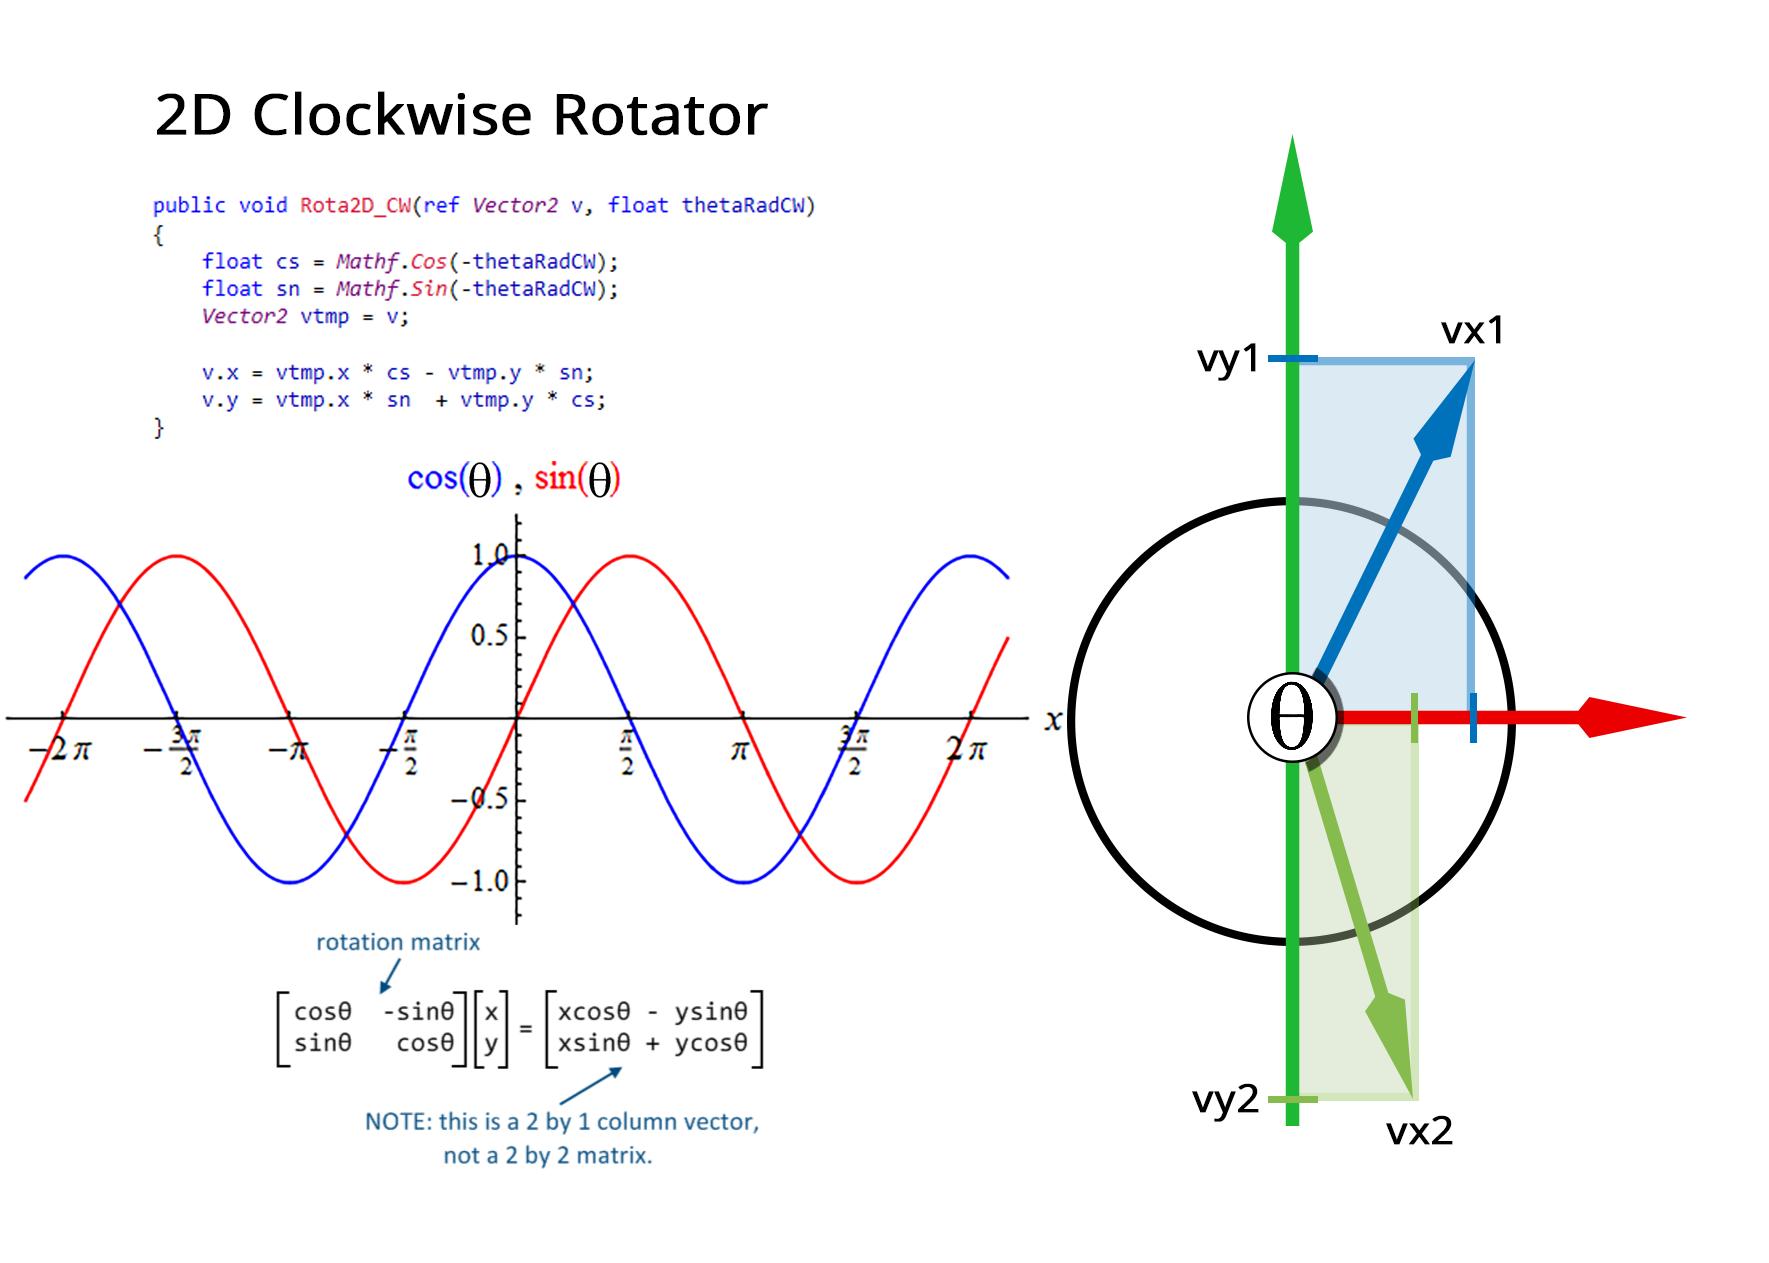 CW+Rotator